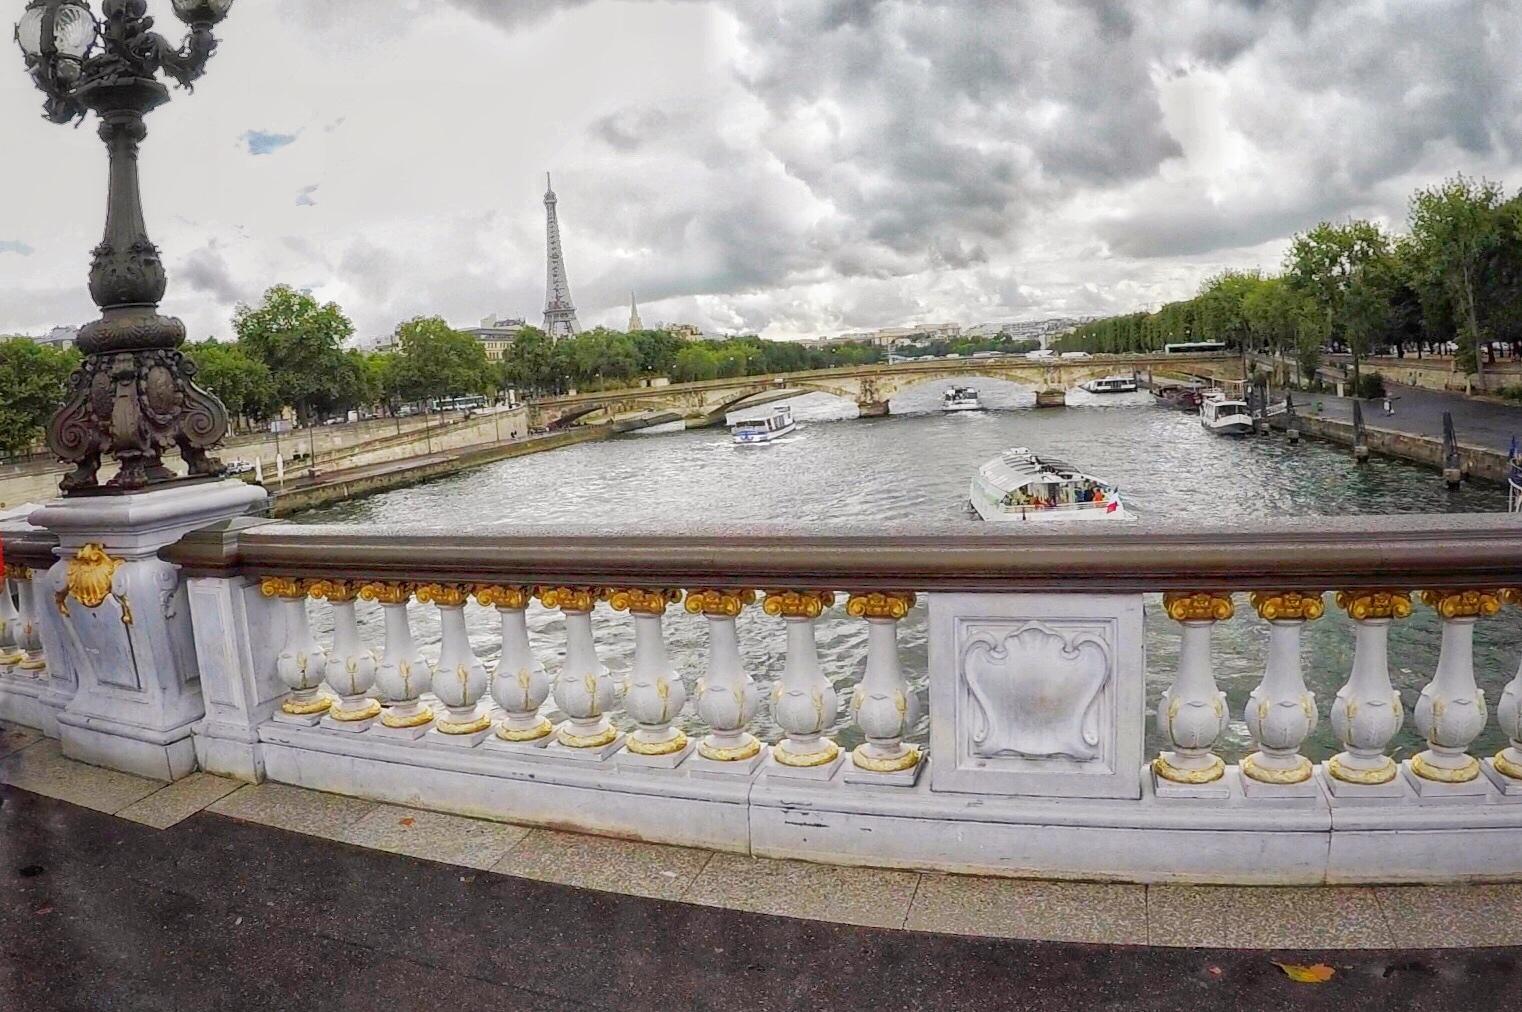 the river seine, the seine, seine, Paris, Paris in the summer, visiting Paris